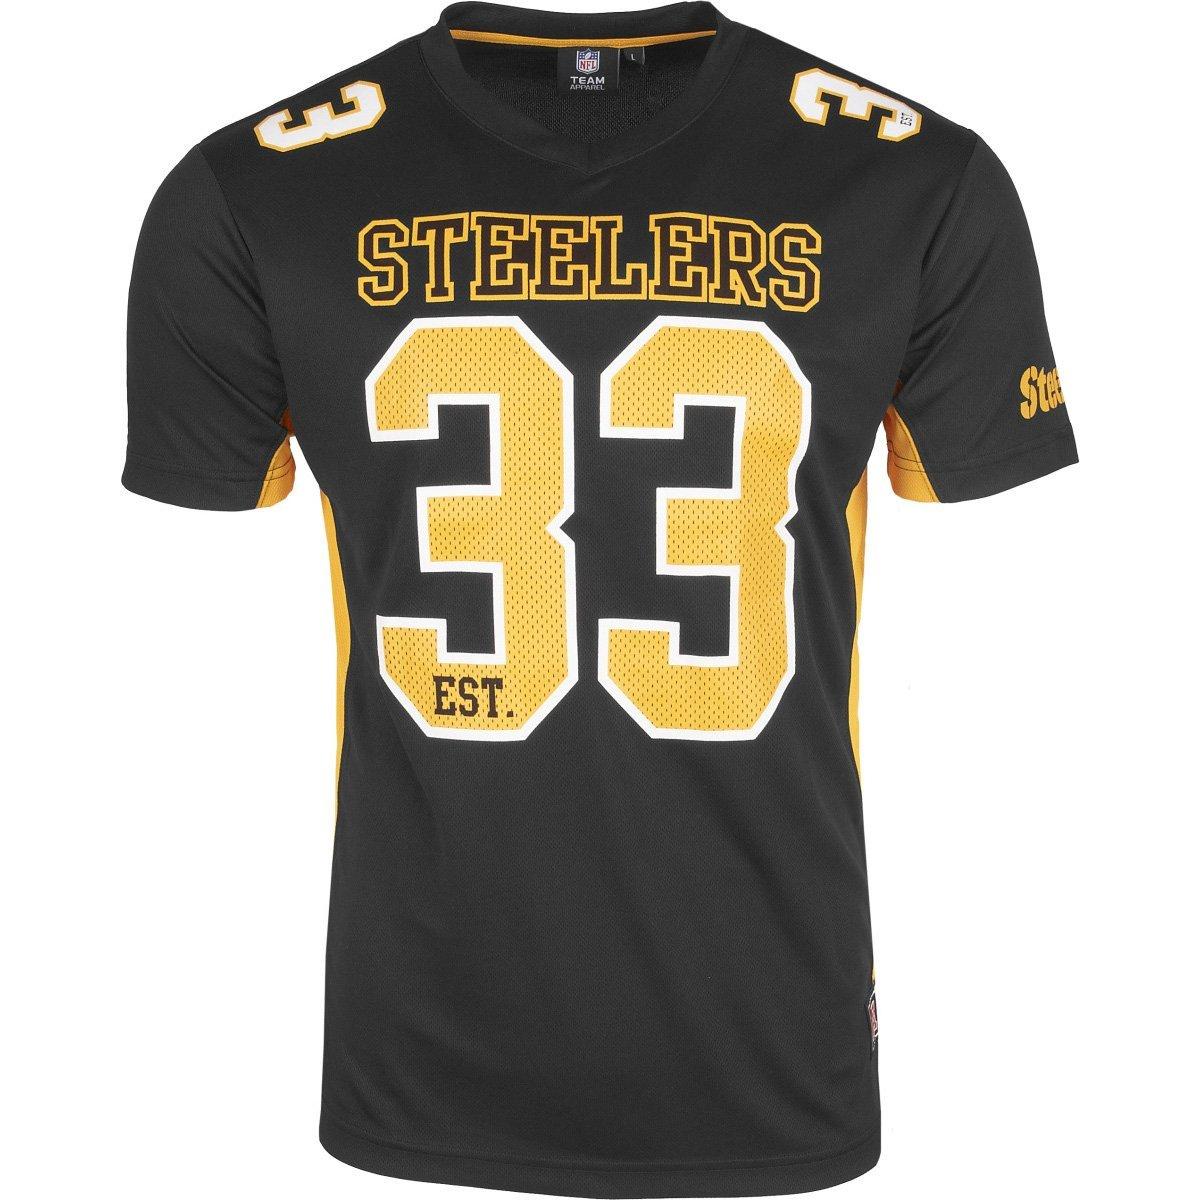 Majestic Pittsburgh Steelers Moro Est. 33 Mesh Jersey NFL T-Shirt majestic athletics